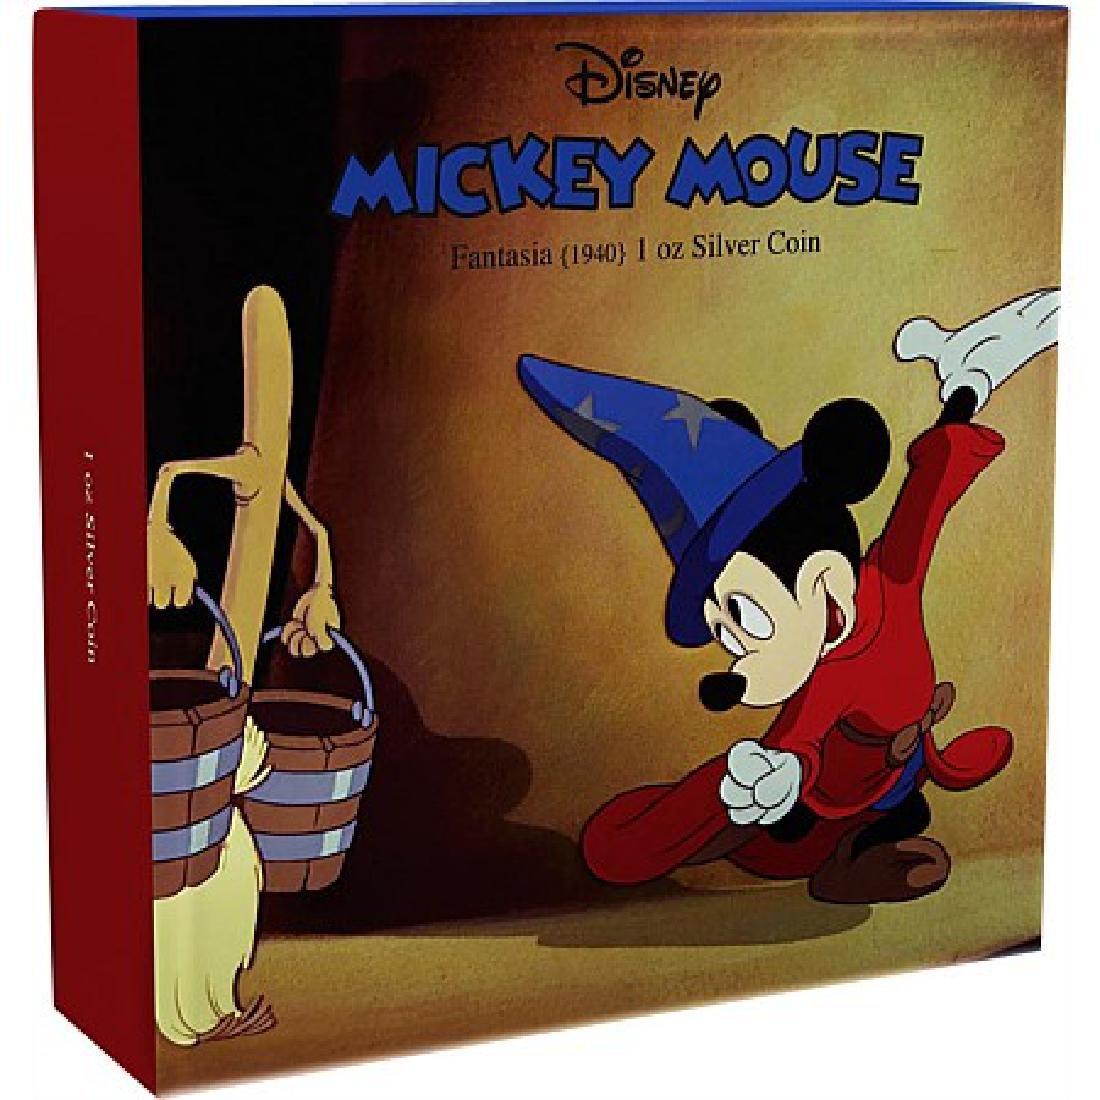 2017 1 oz Silver $2 Mickey Through the Ages: Fantasia - 5